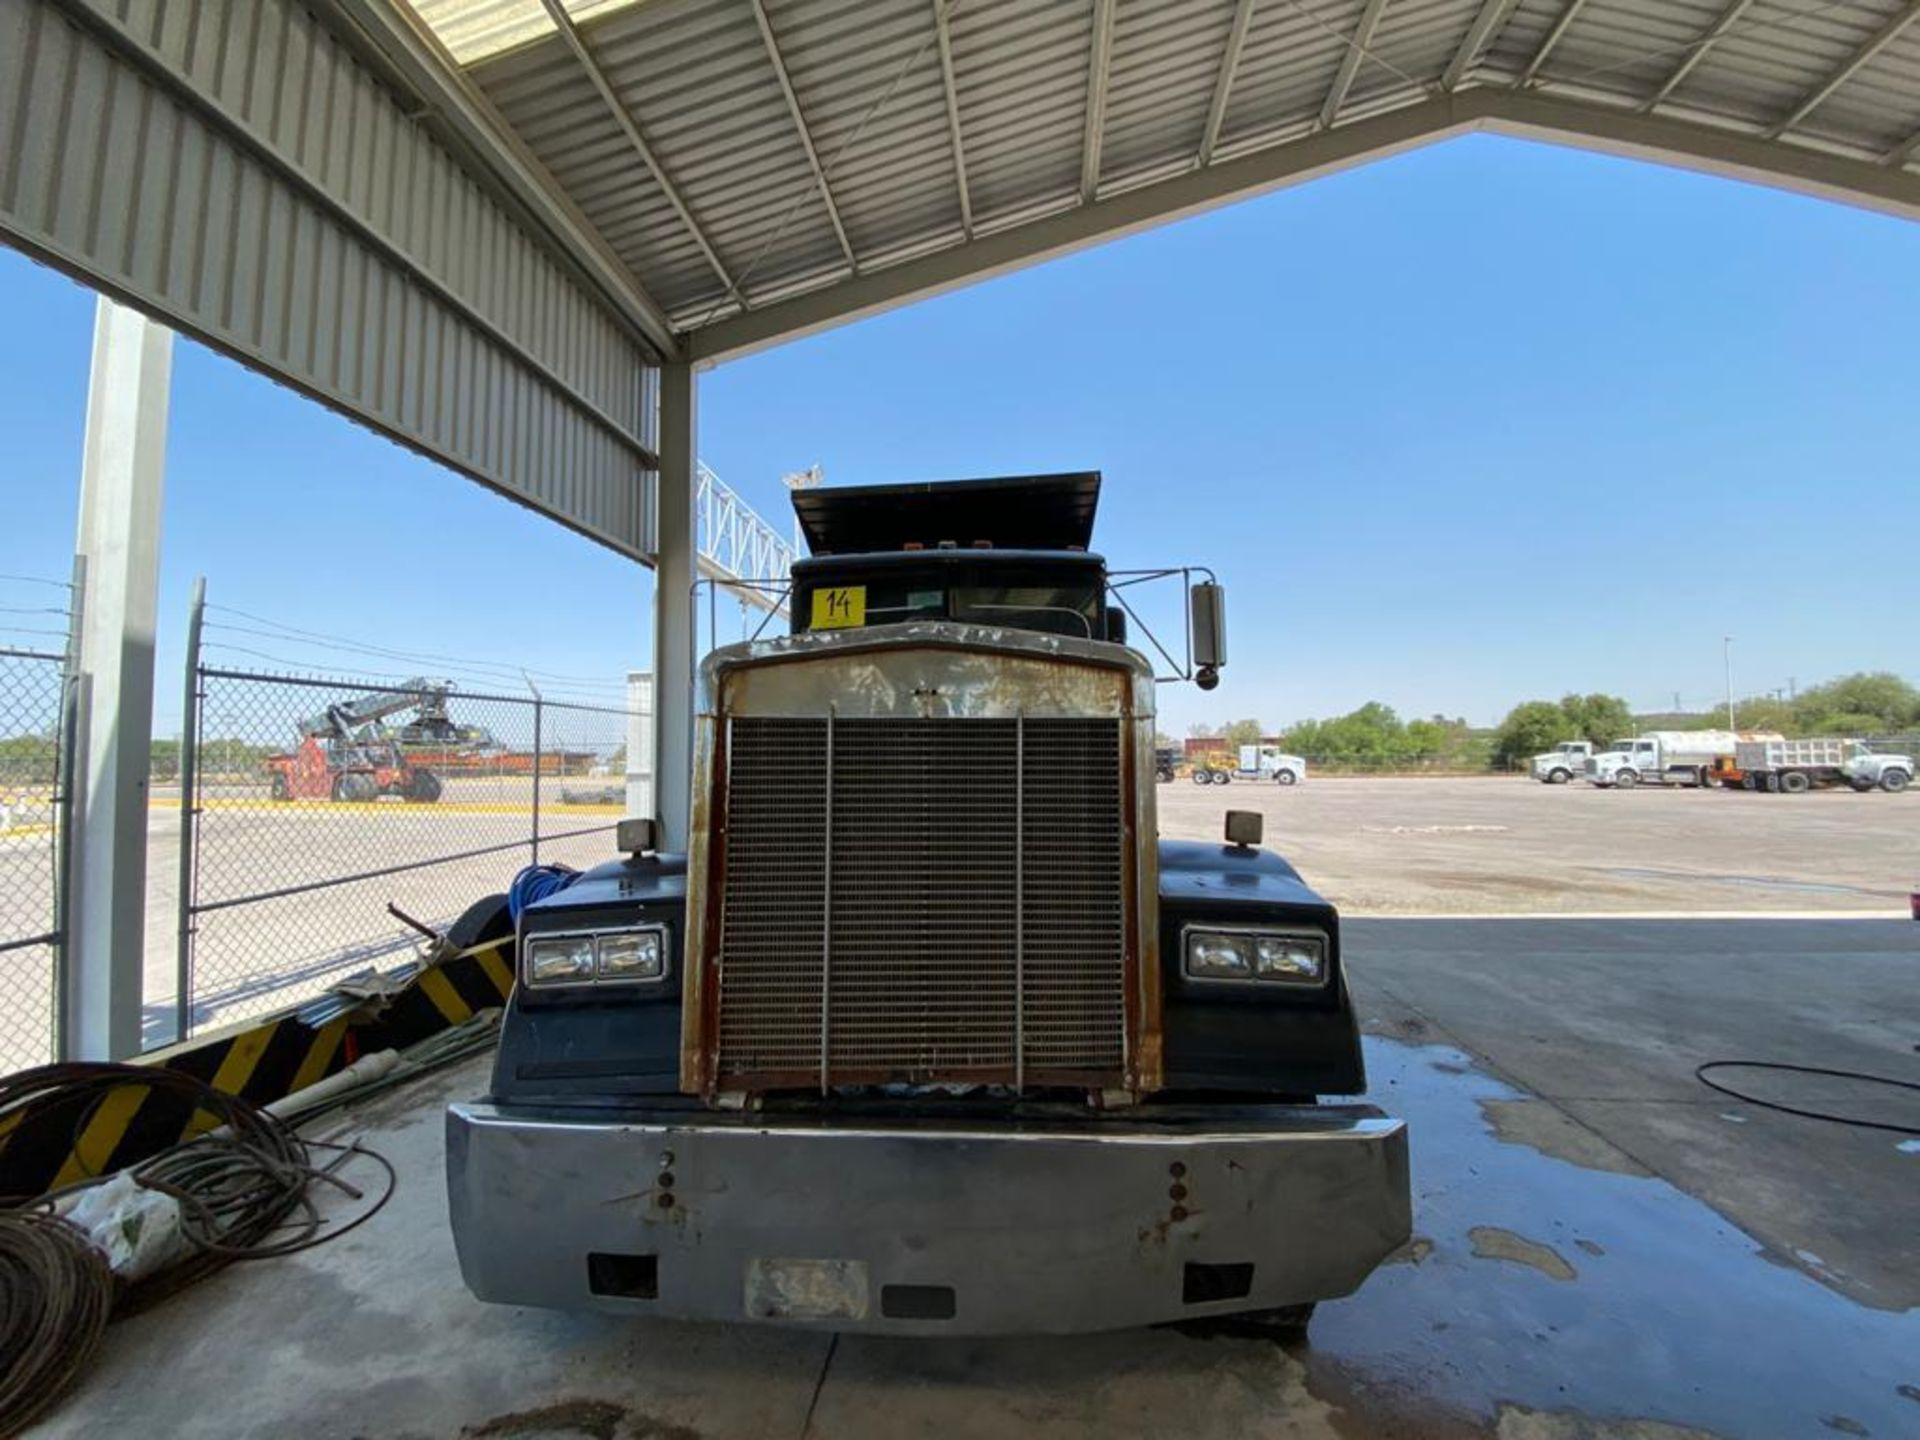 1983 Kenworth Dump Truck, standard transmission of 10 speeds, with Cummins motor - Image 67 of 68